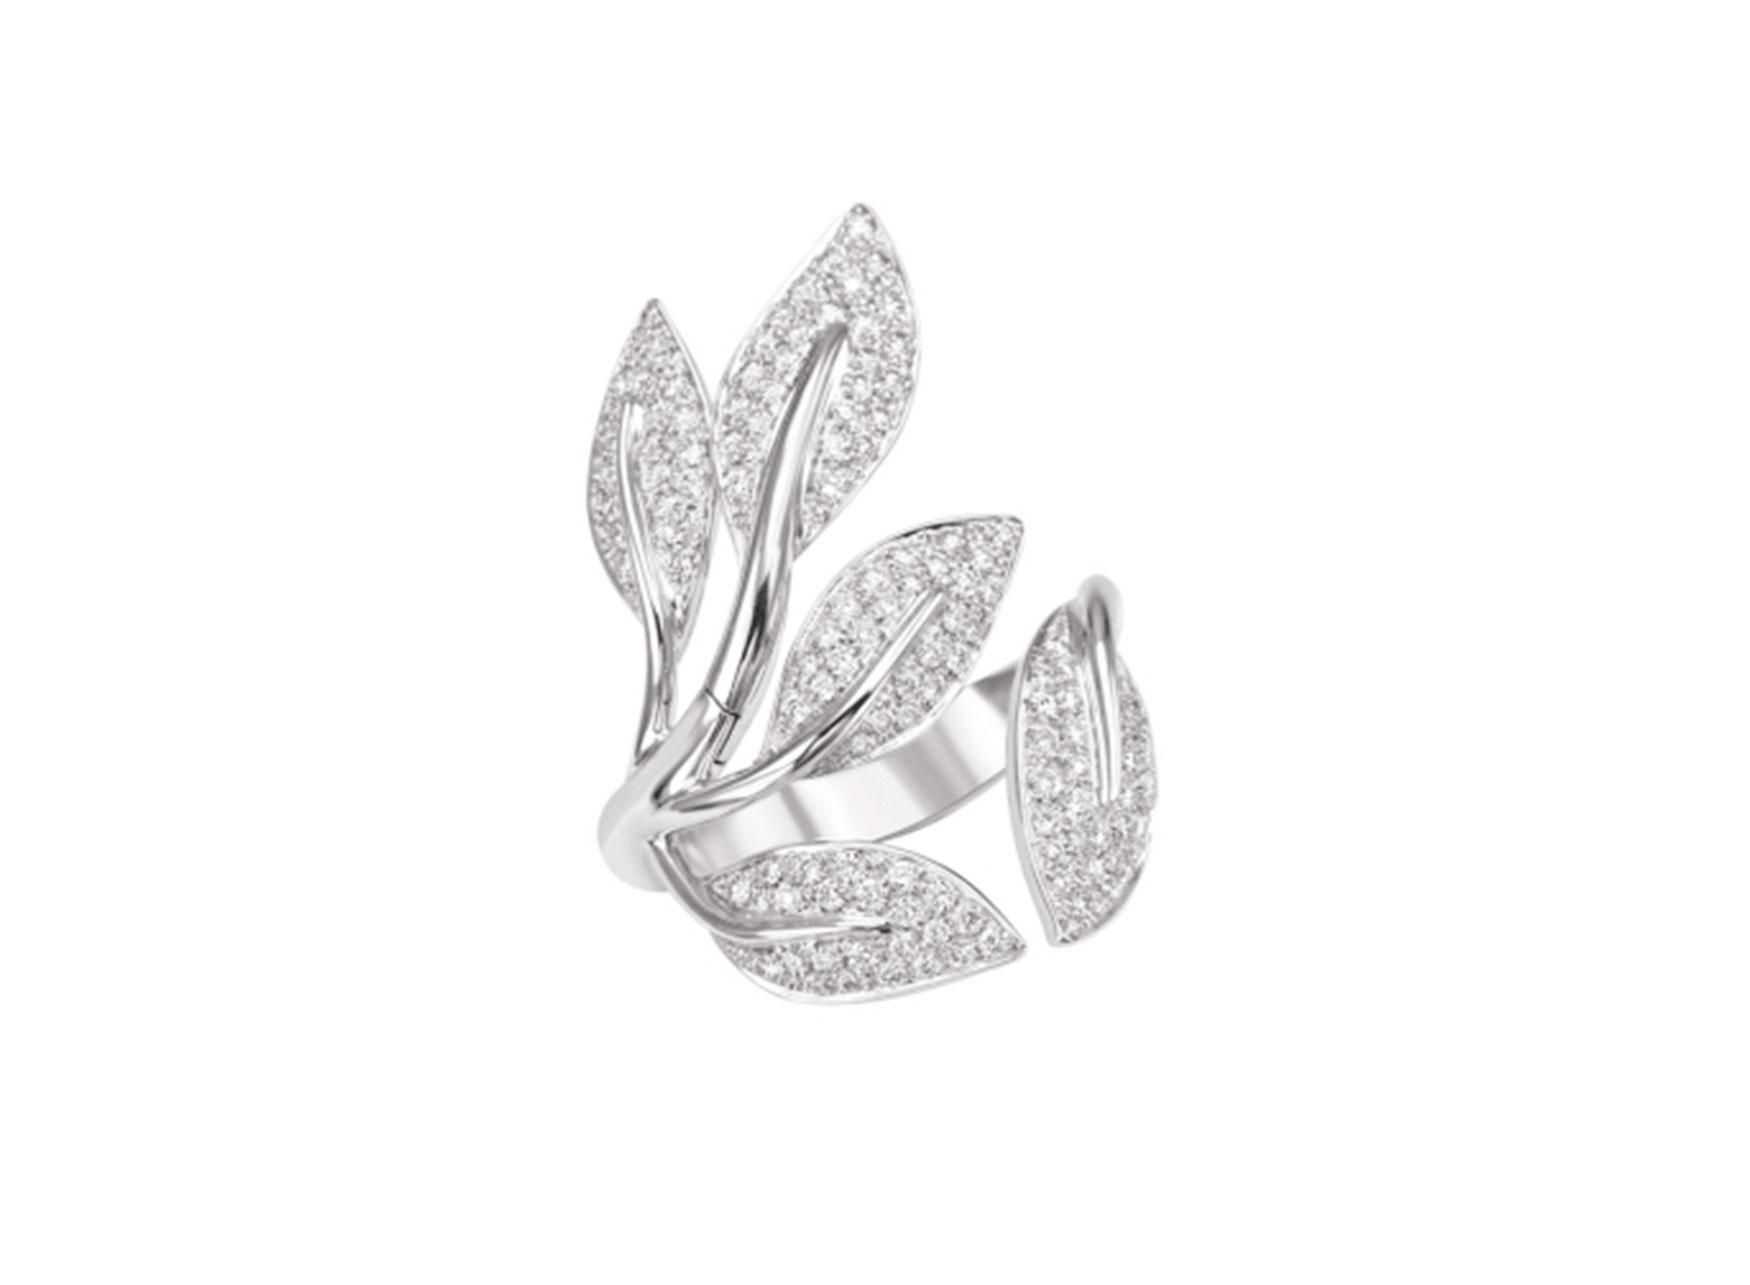 MIMI Anillo Foglia Oro Blanco y Diamantes